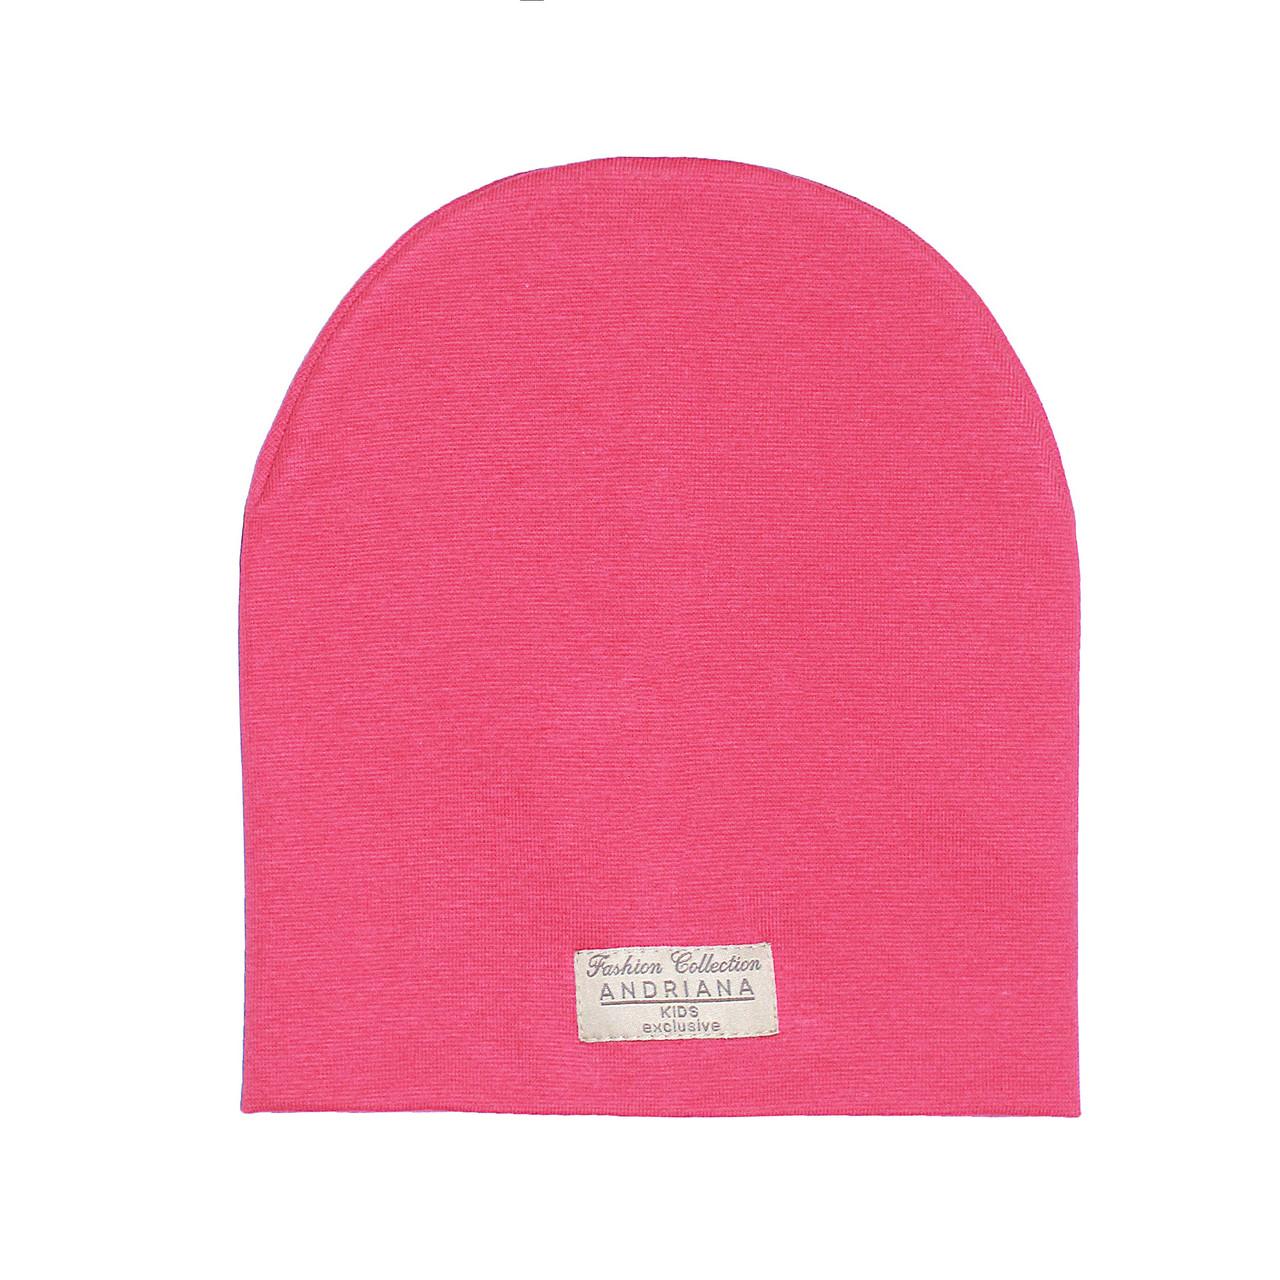 Двойная шапочка 44-46,48-50 см. Andriana Kids малиновая